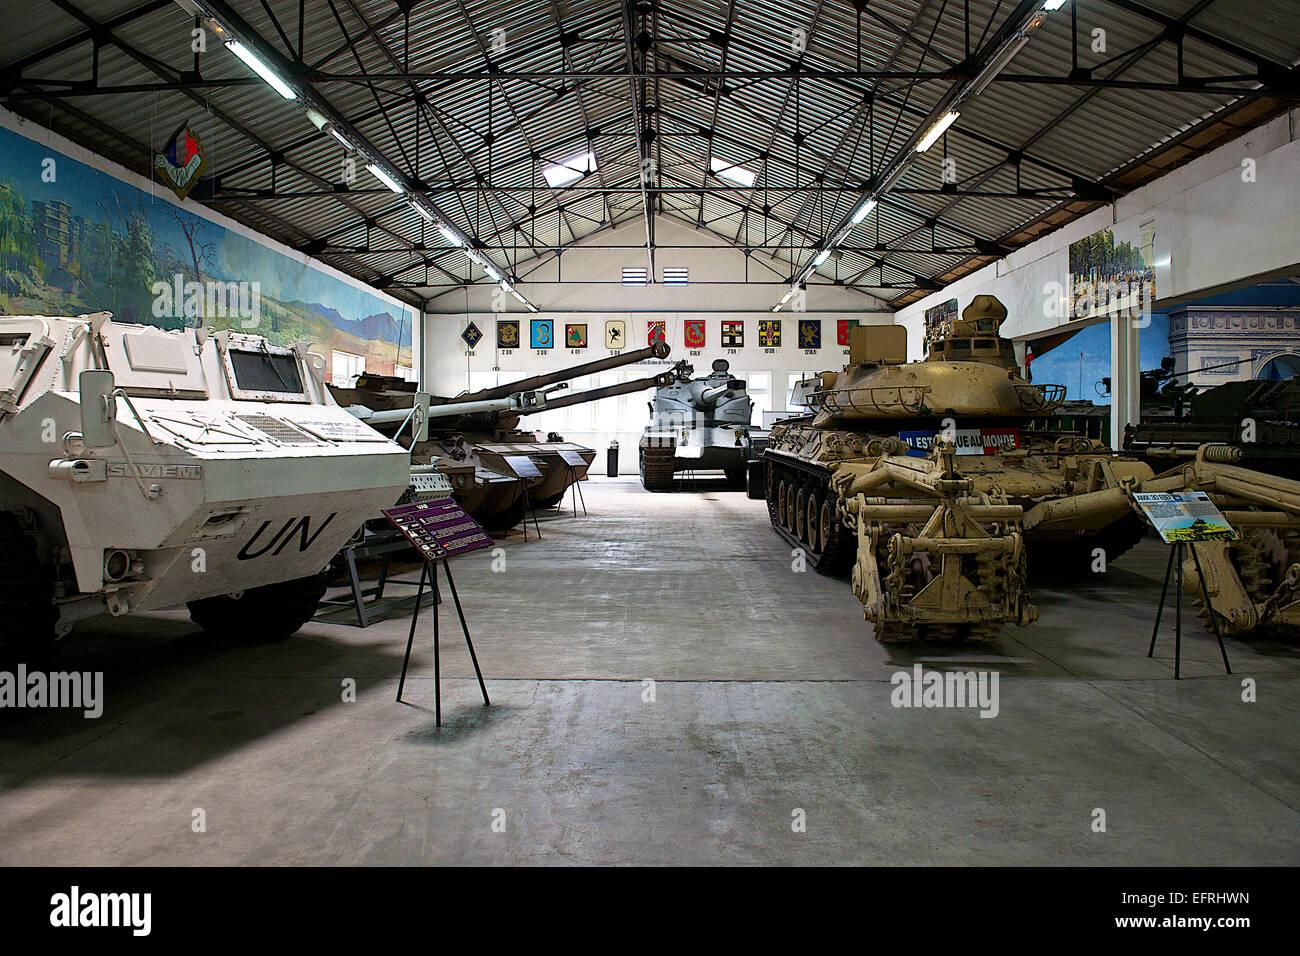 saumur tank museum france stockfotos saumur tank museum france bilder alamy. Black Bedroom Furniture Sets. Home Design Ideas